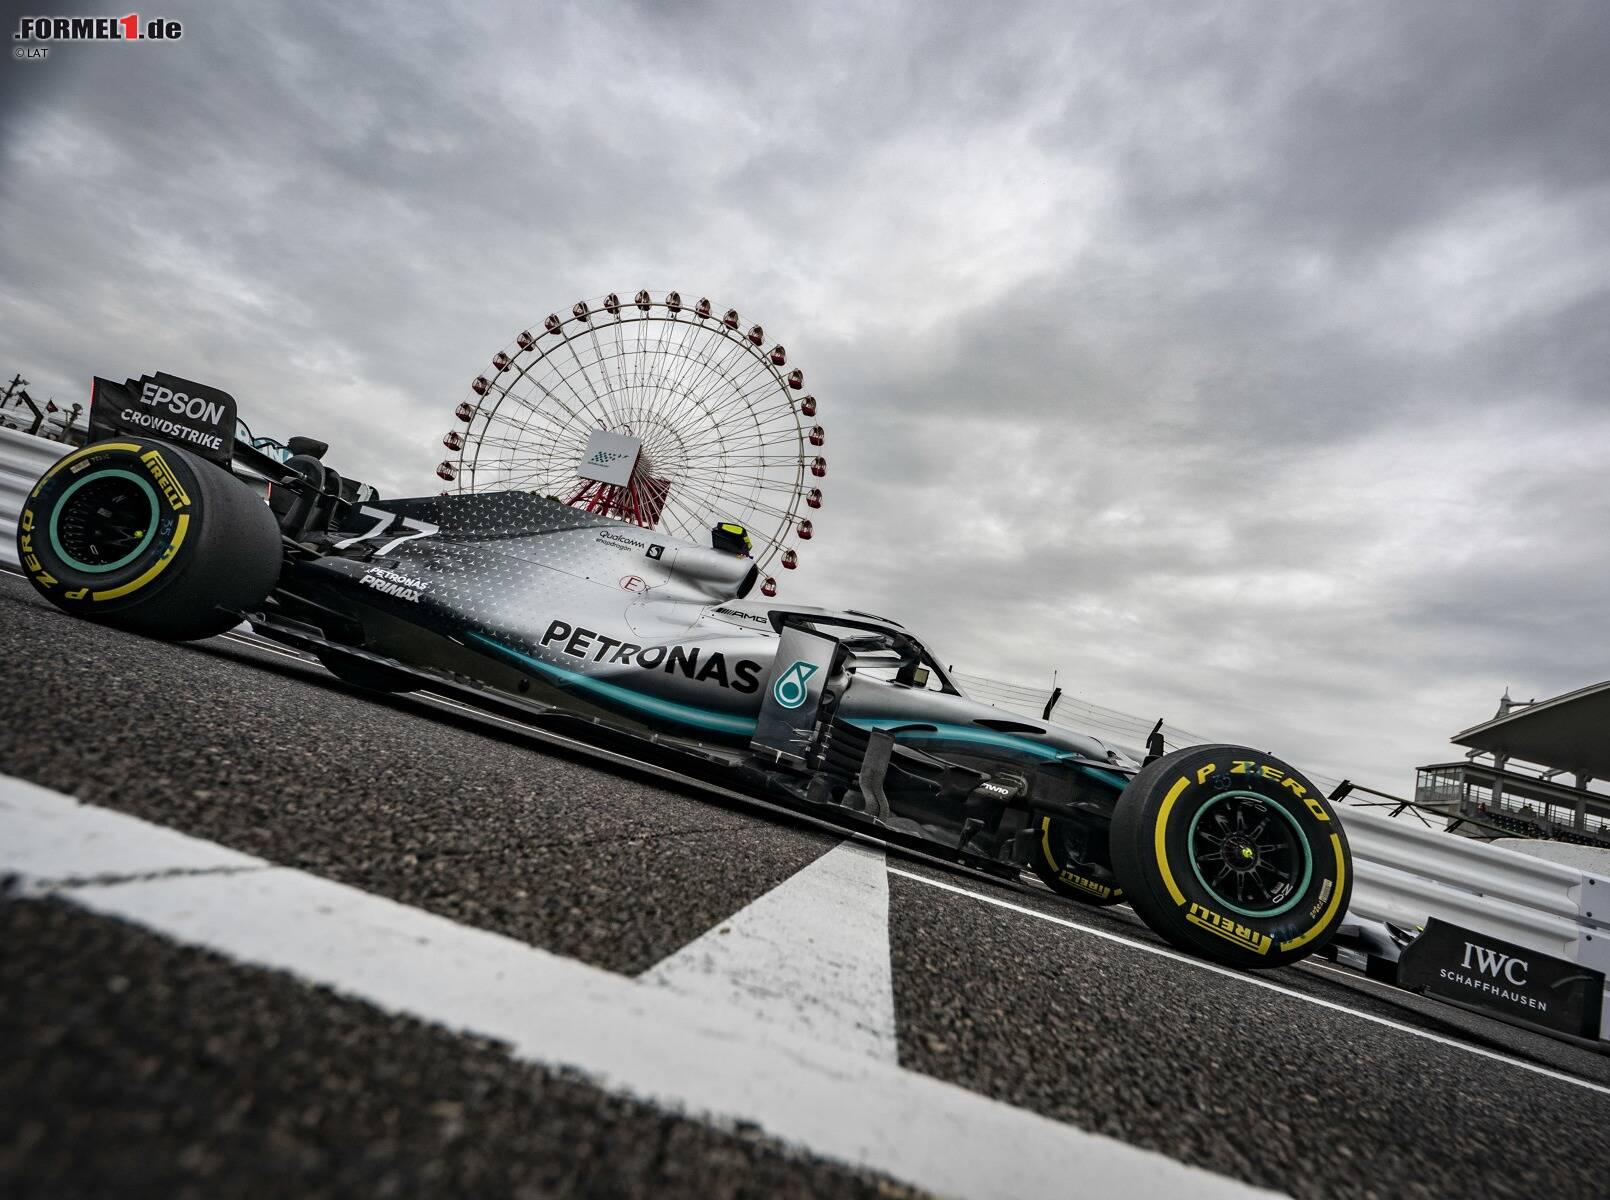 Formel 1 Suzuka 2019